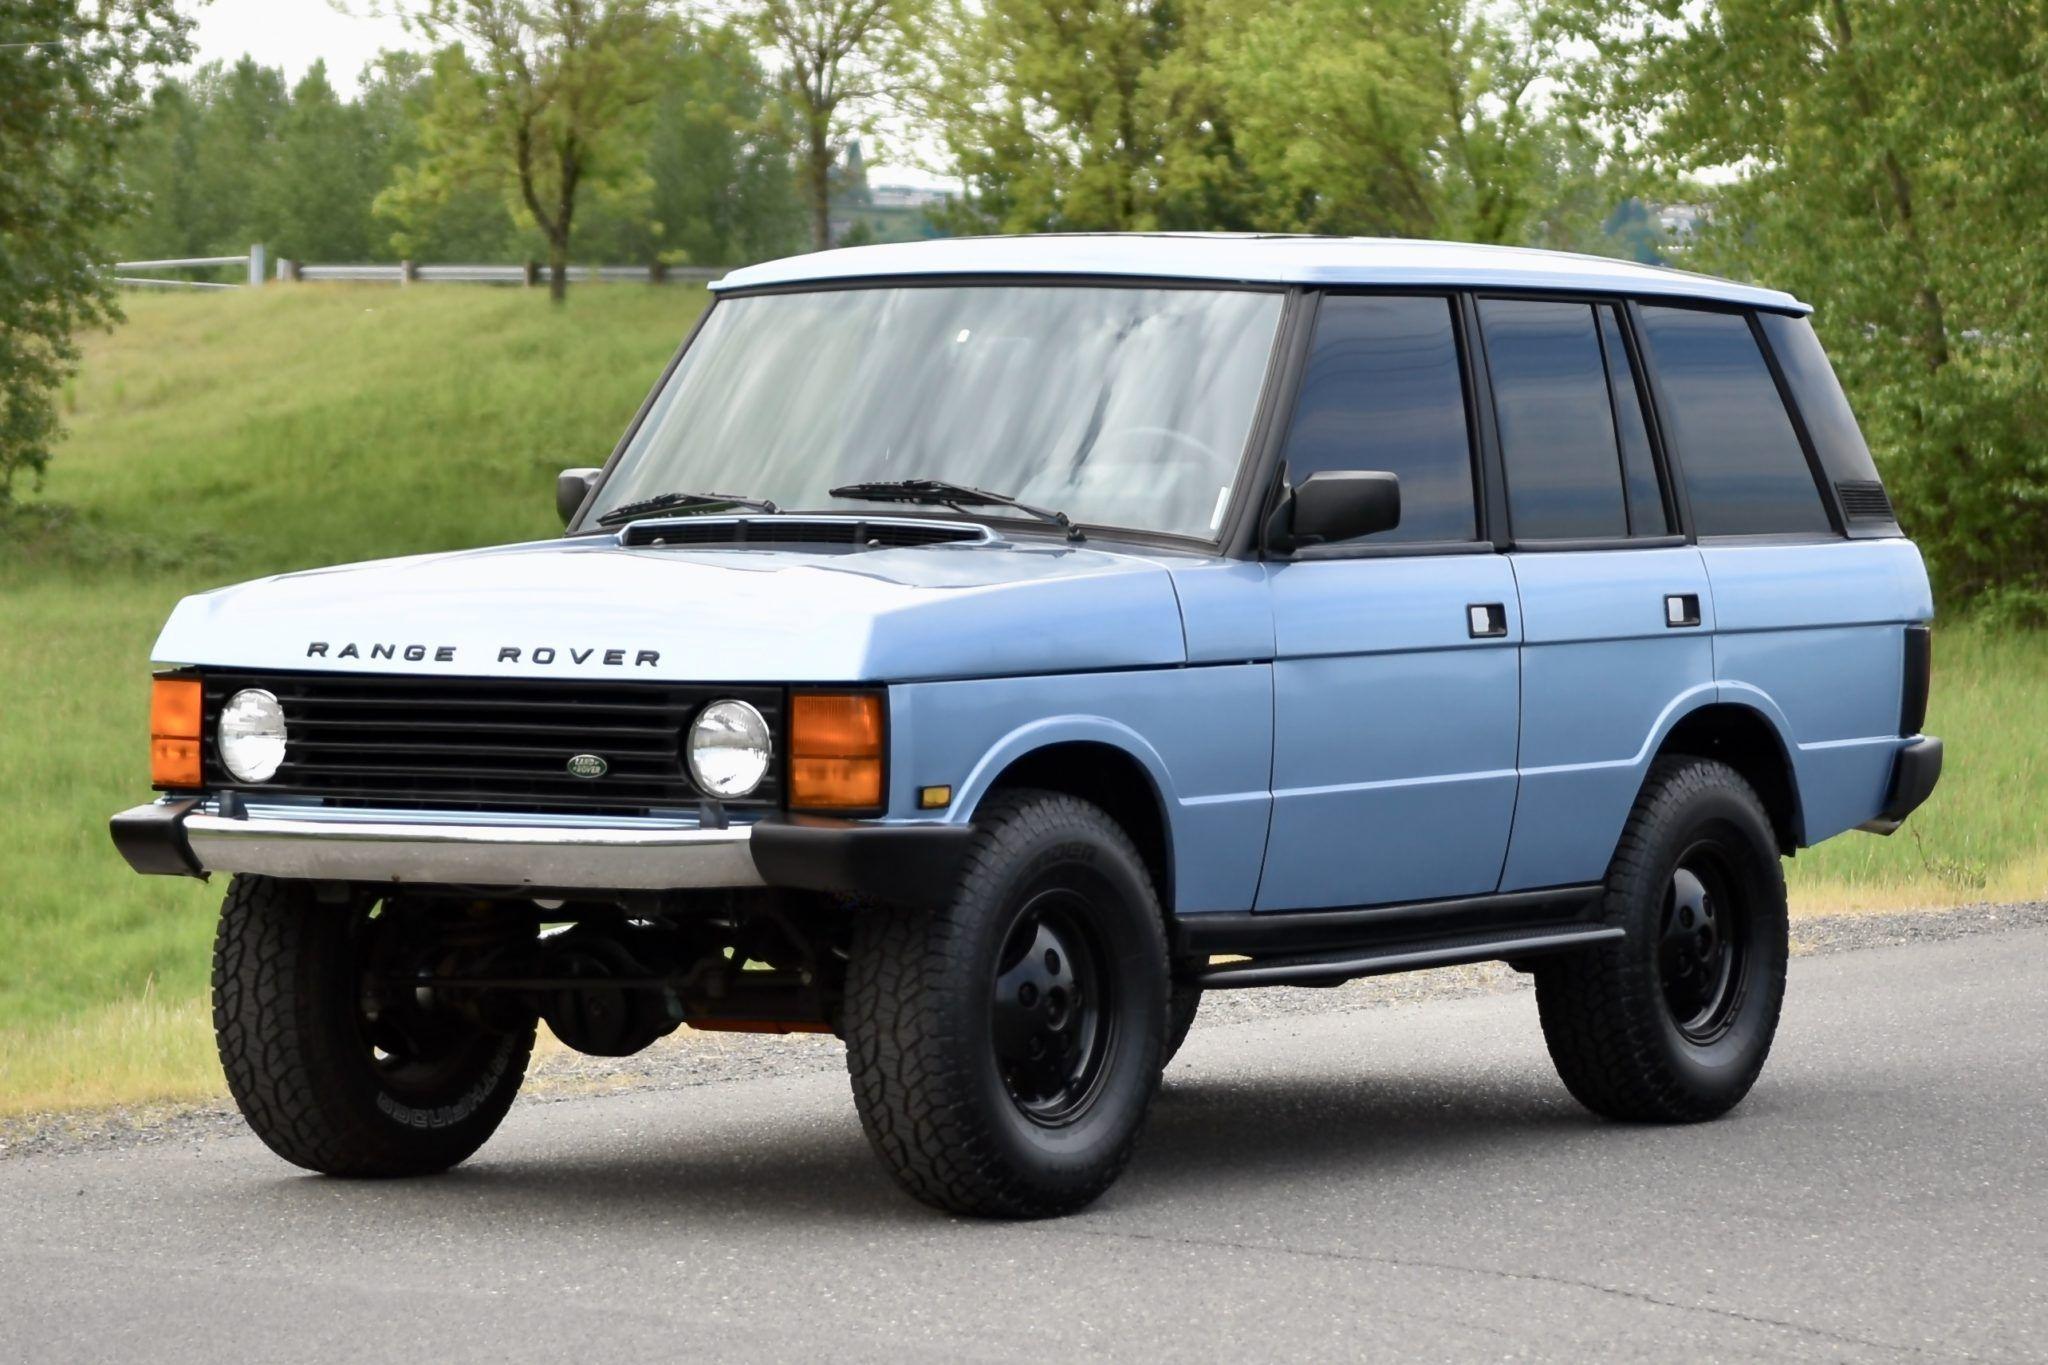 1990 Land Rover Range Rover Classic SWB in 2020 Range